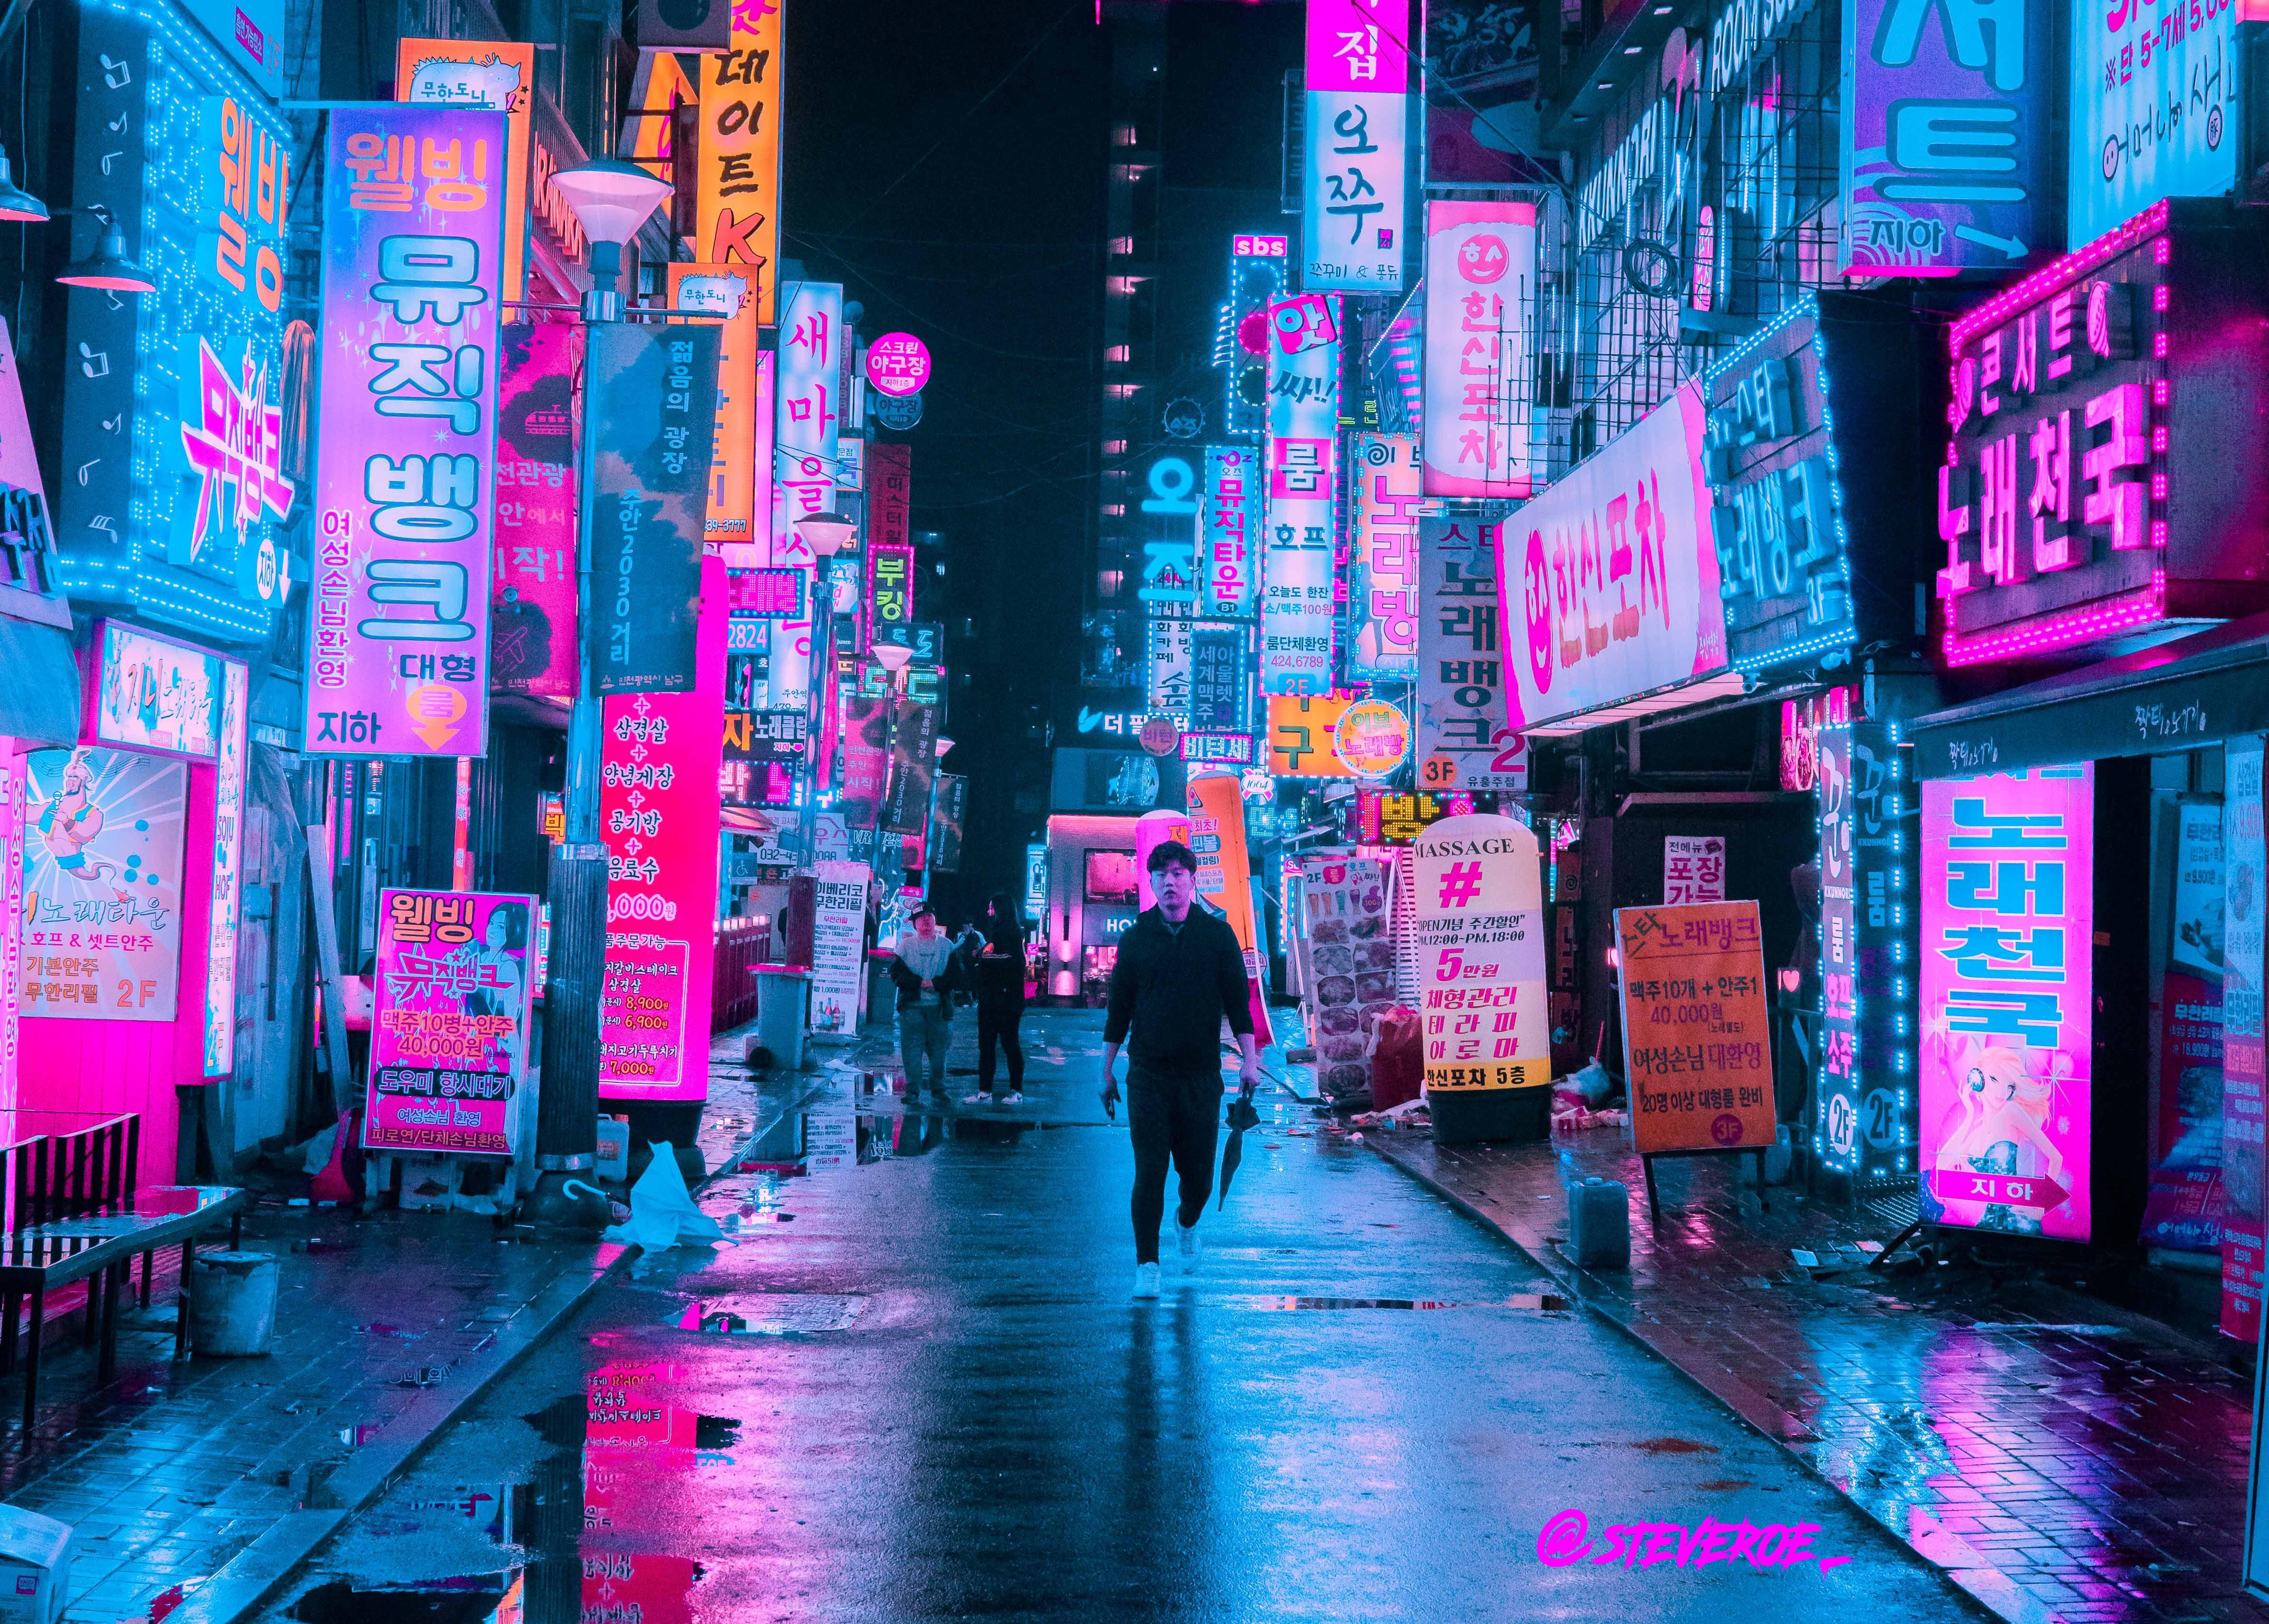 Incheon South Korea [4774 3417] | <3Korea in 2019 | Cyberpunk city